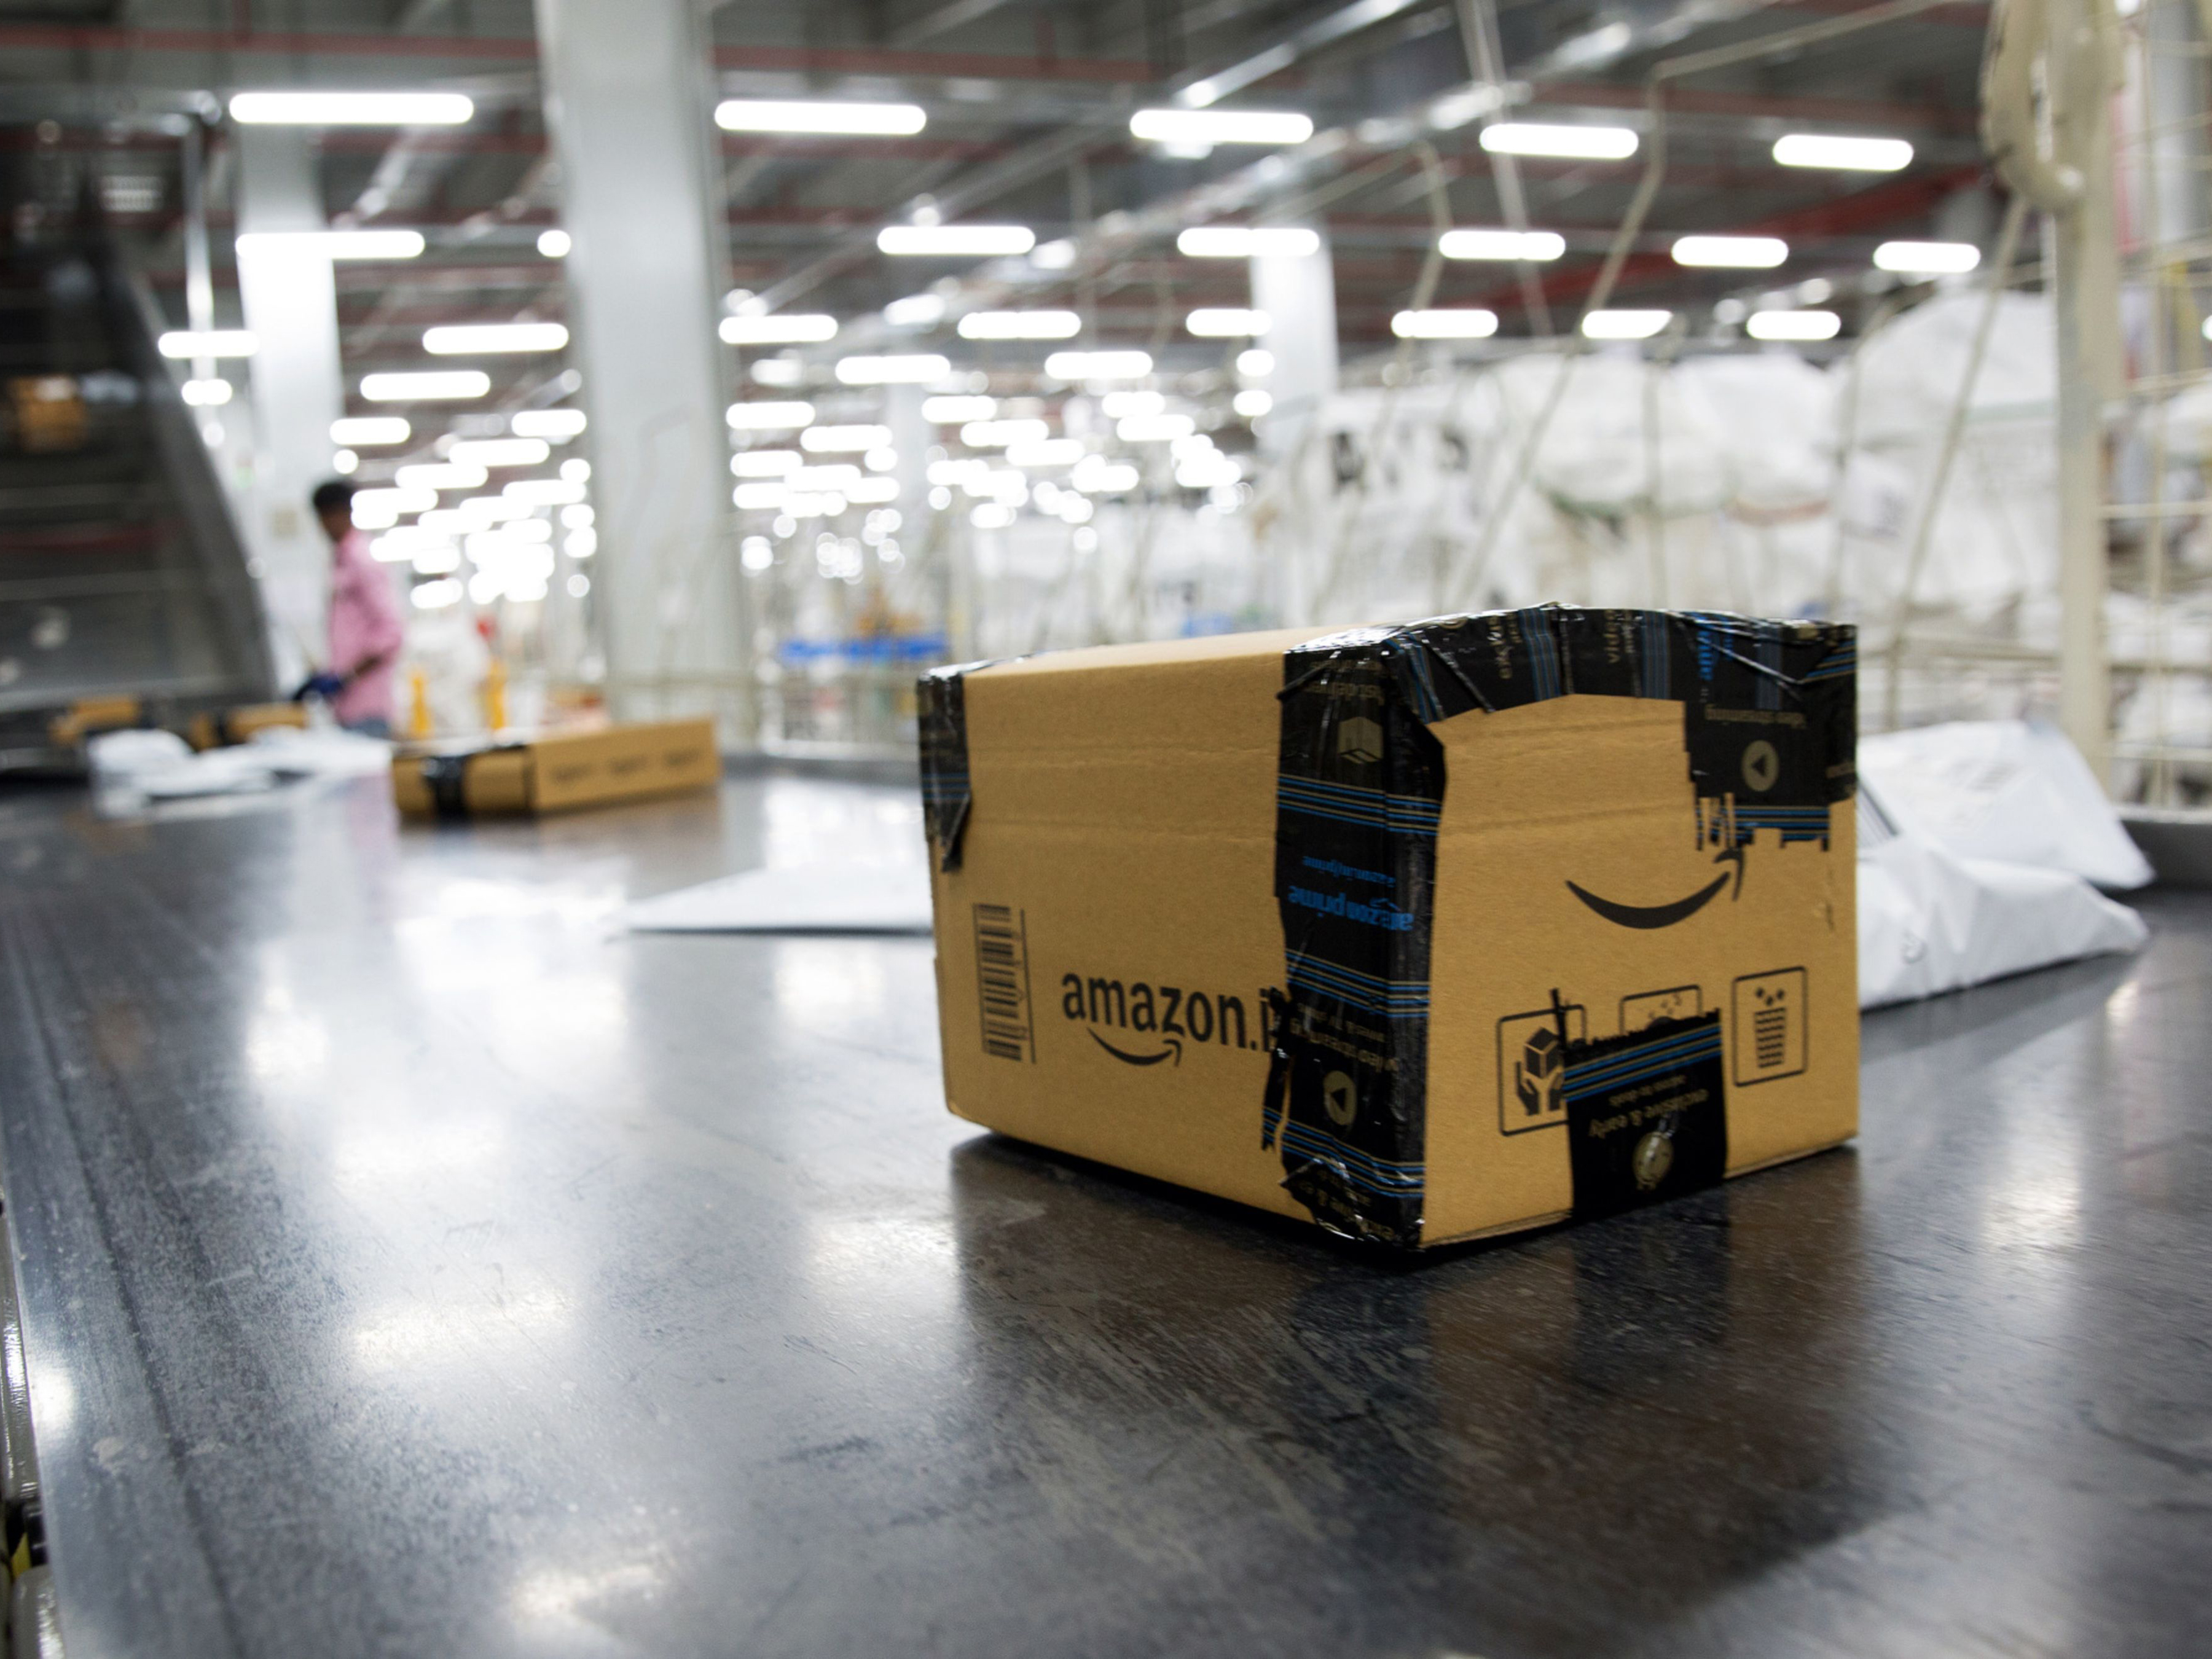 How Amazon Plans to Retrain 100,000 Employees